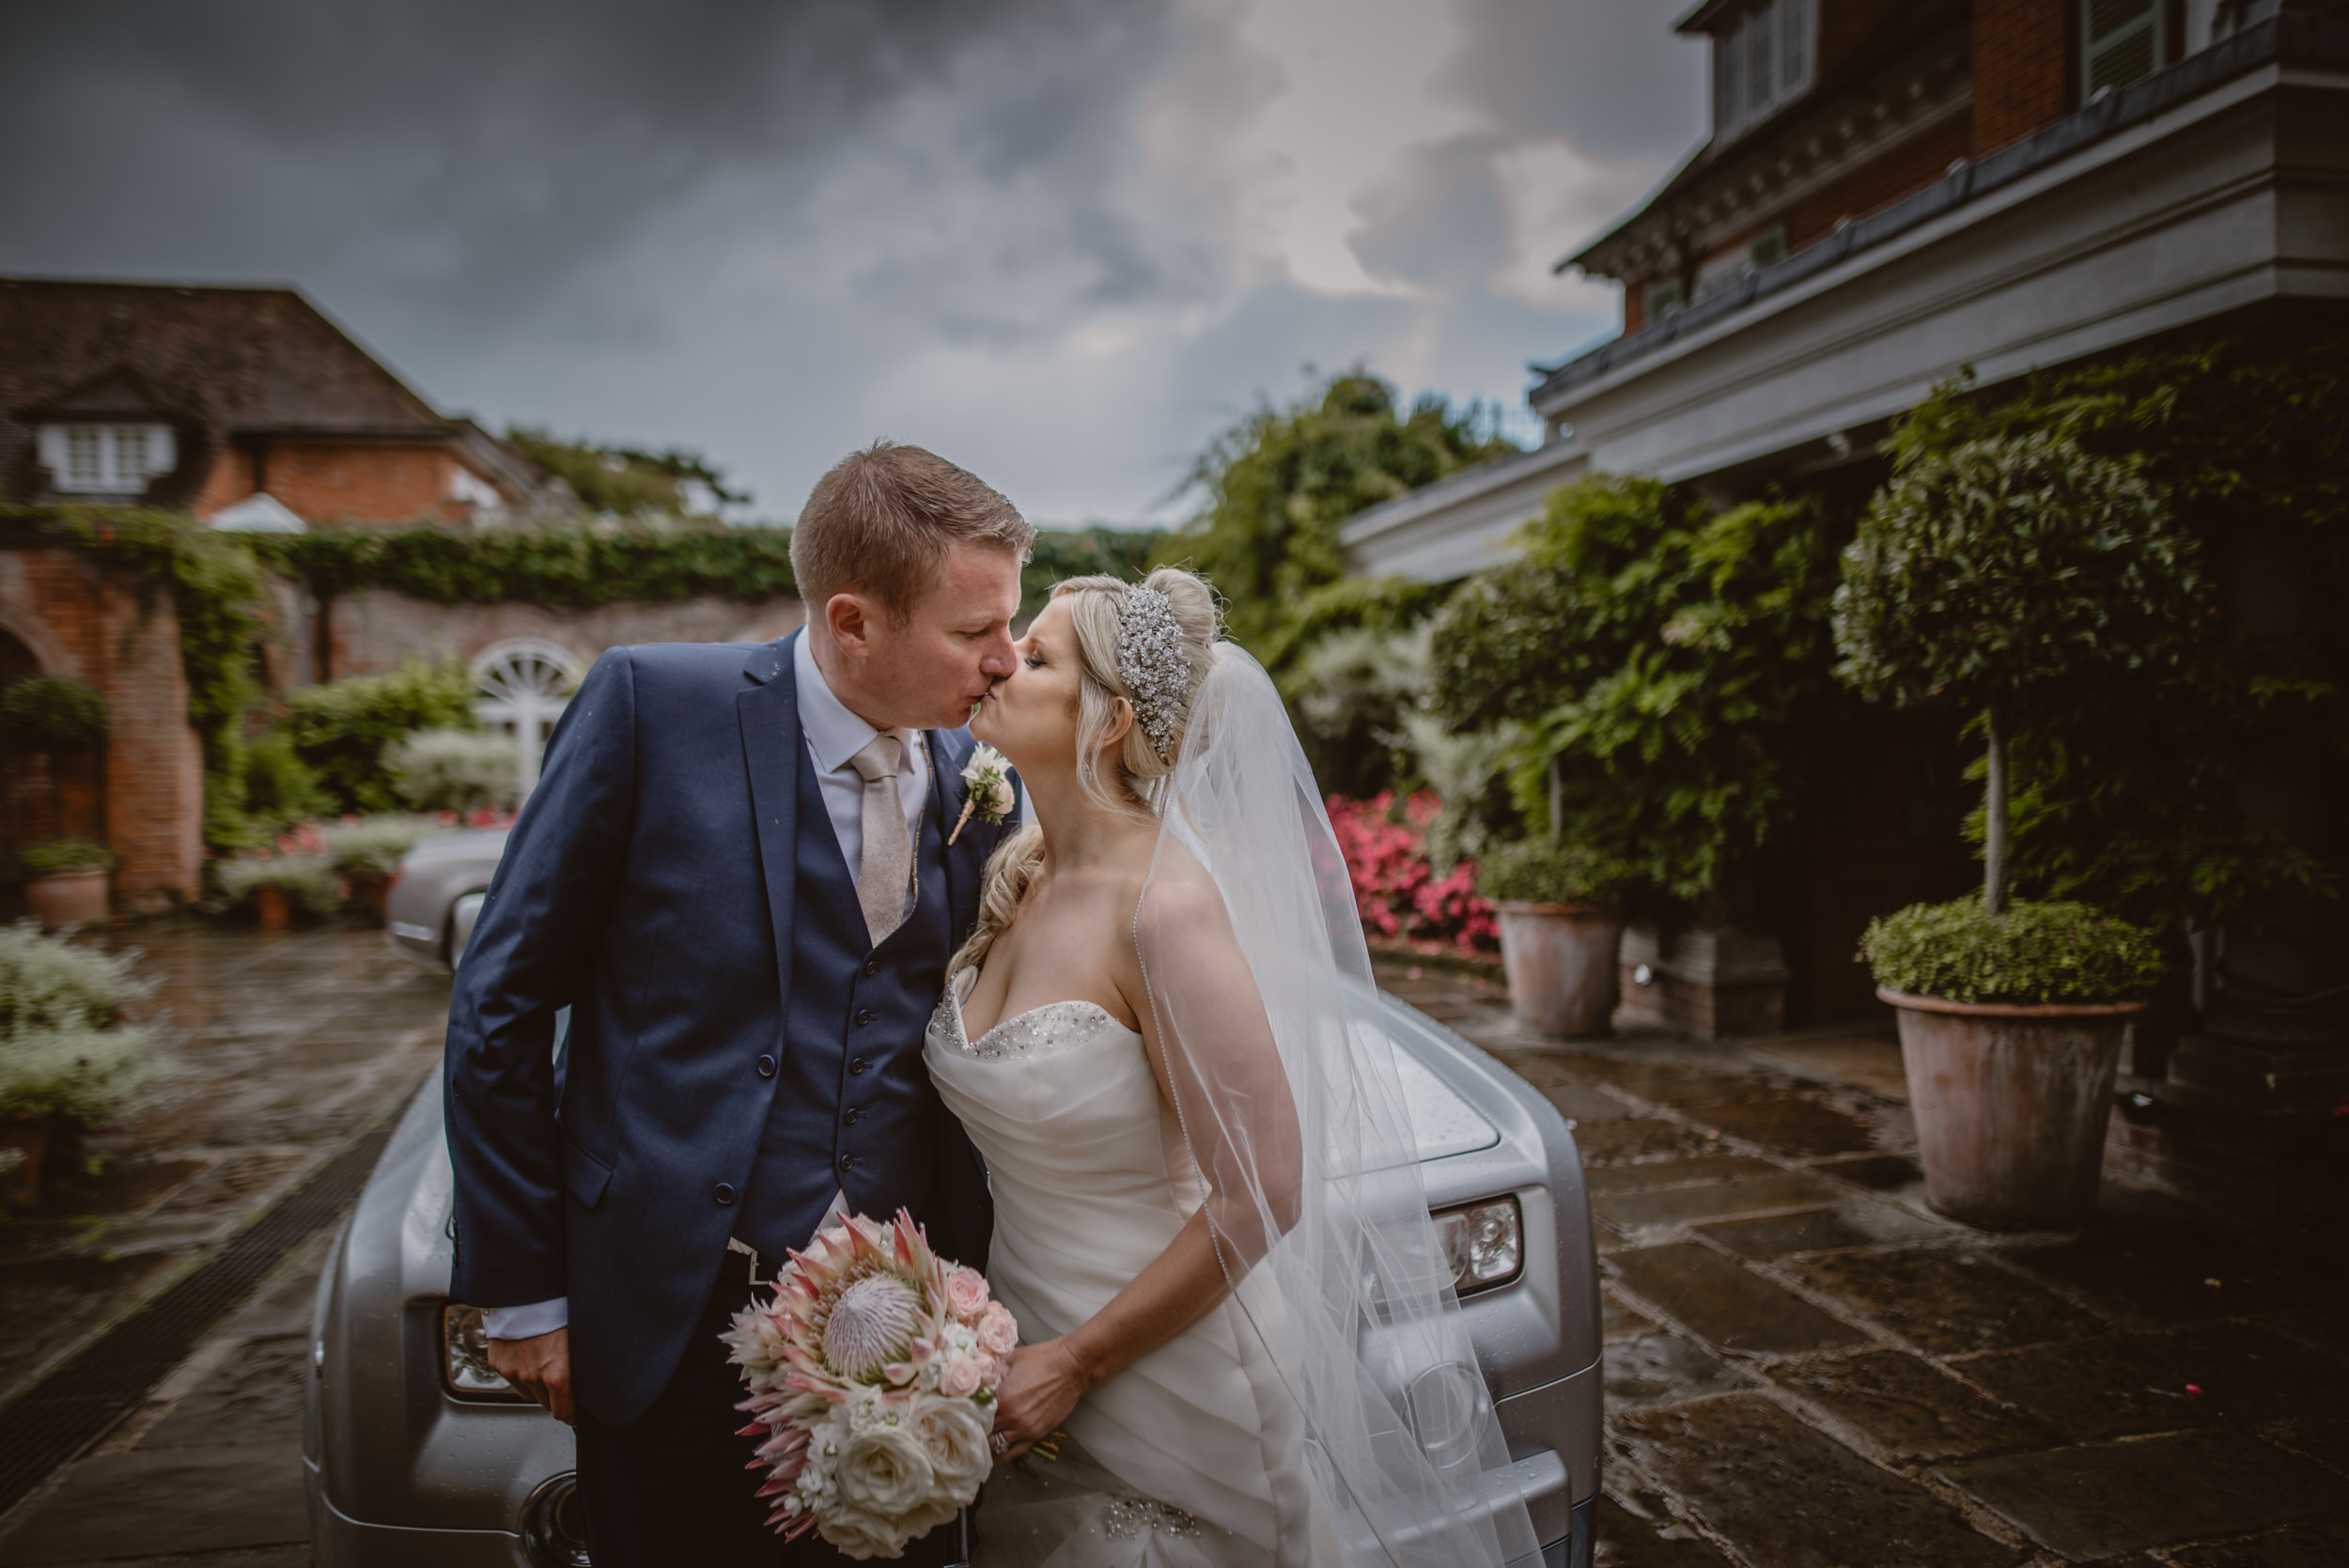 Trisha-and-Roger-wedding-The-Priory-Church-and-Chewton-Glen-Hotel-Christchurch-Manu-Mendoza-Wedding-Photography-240.jpg